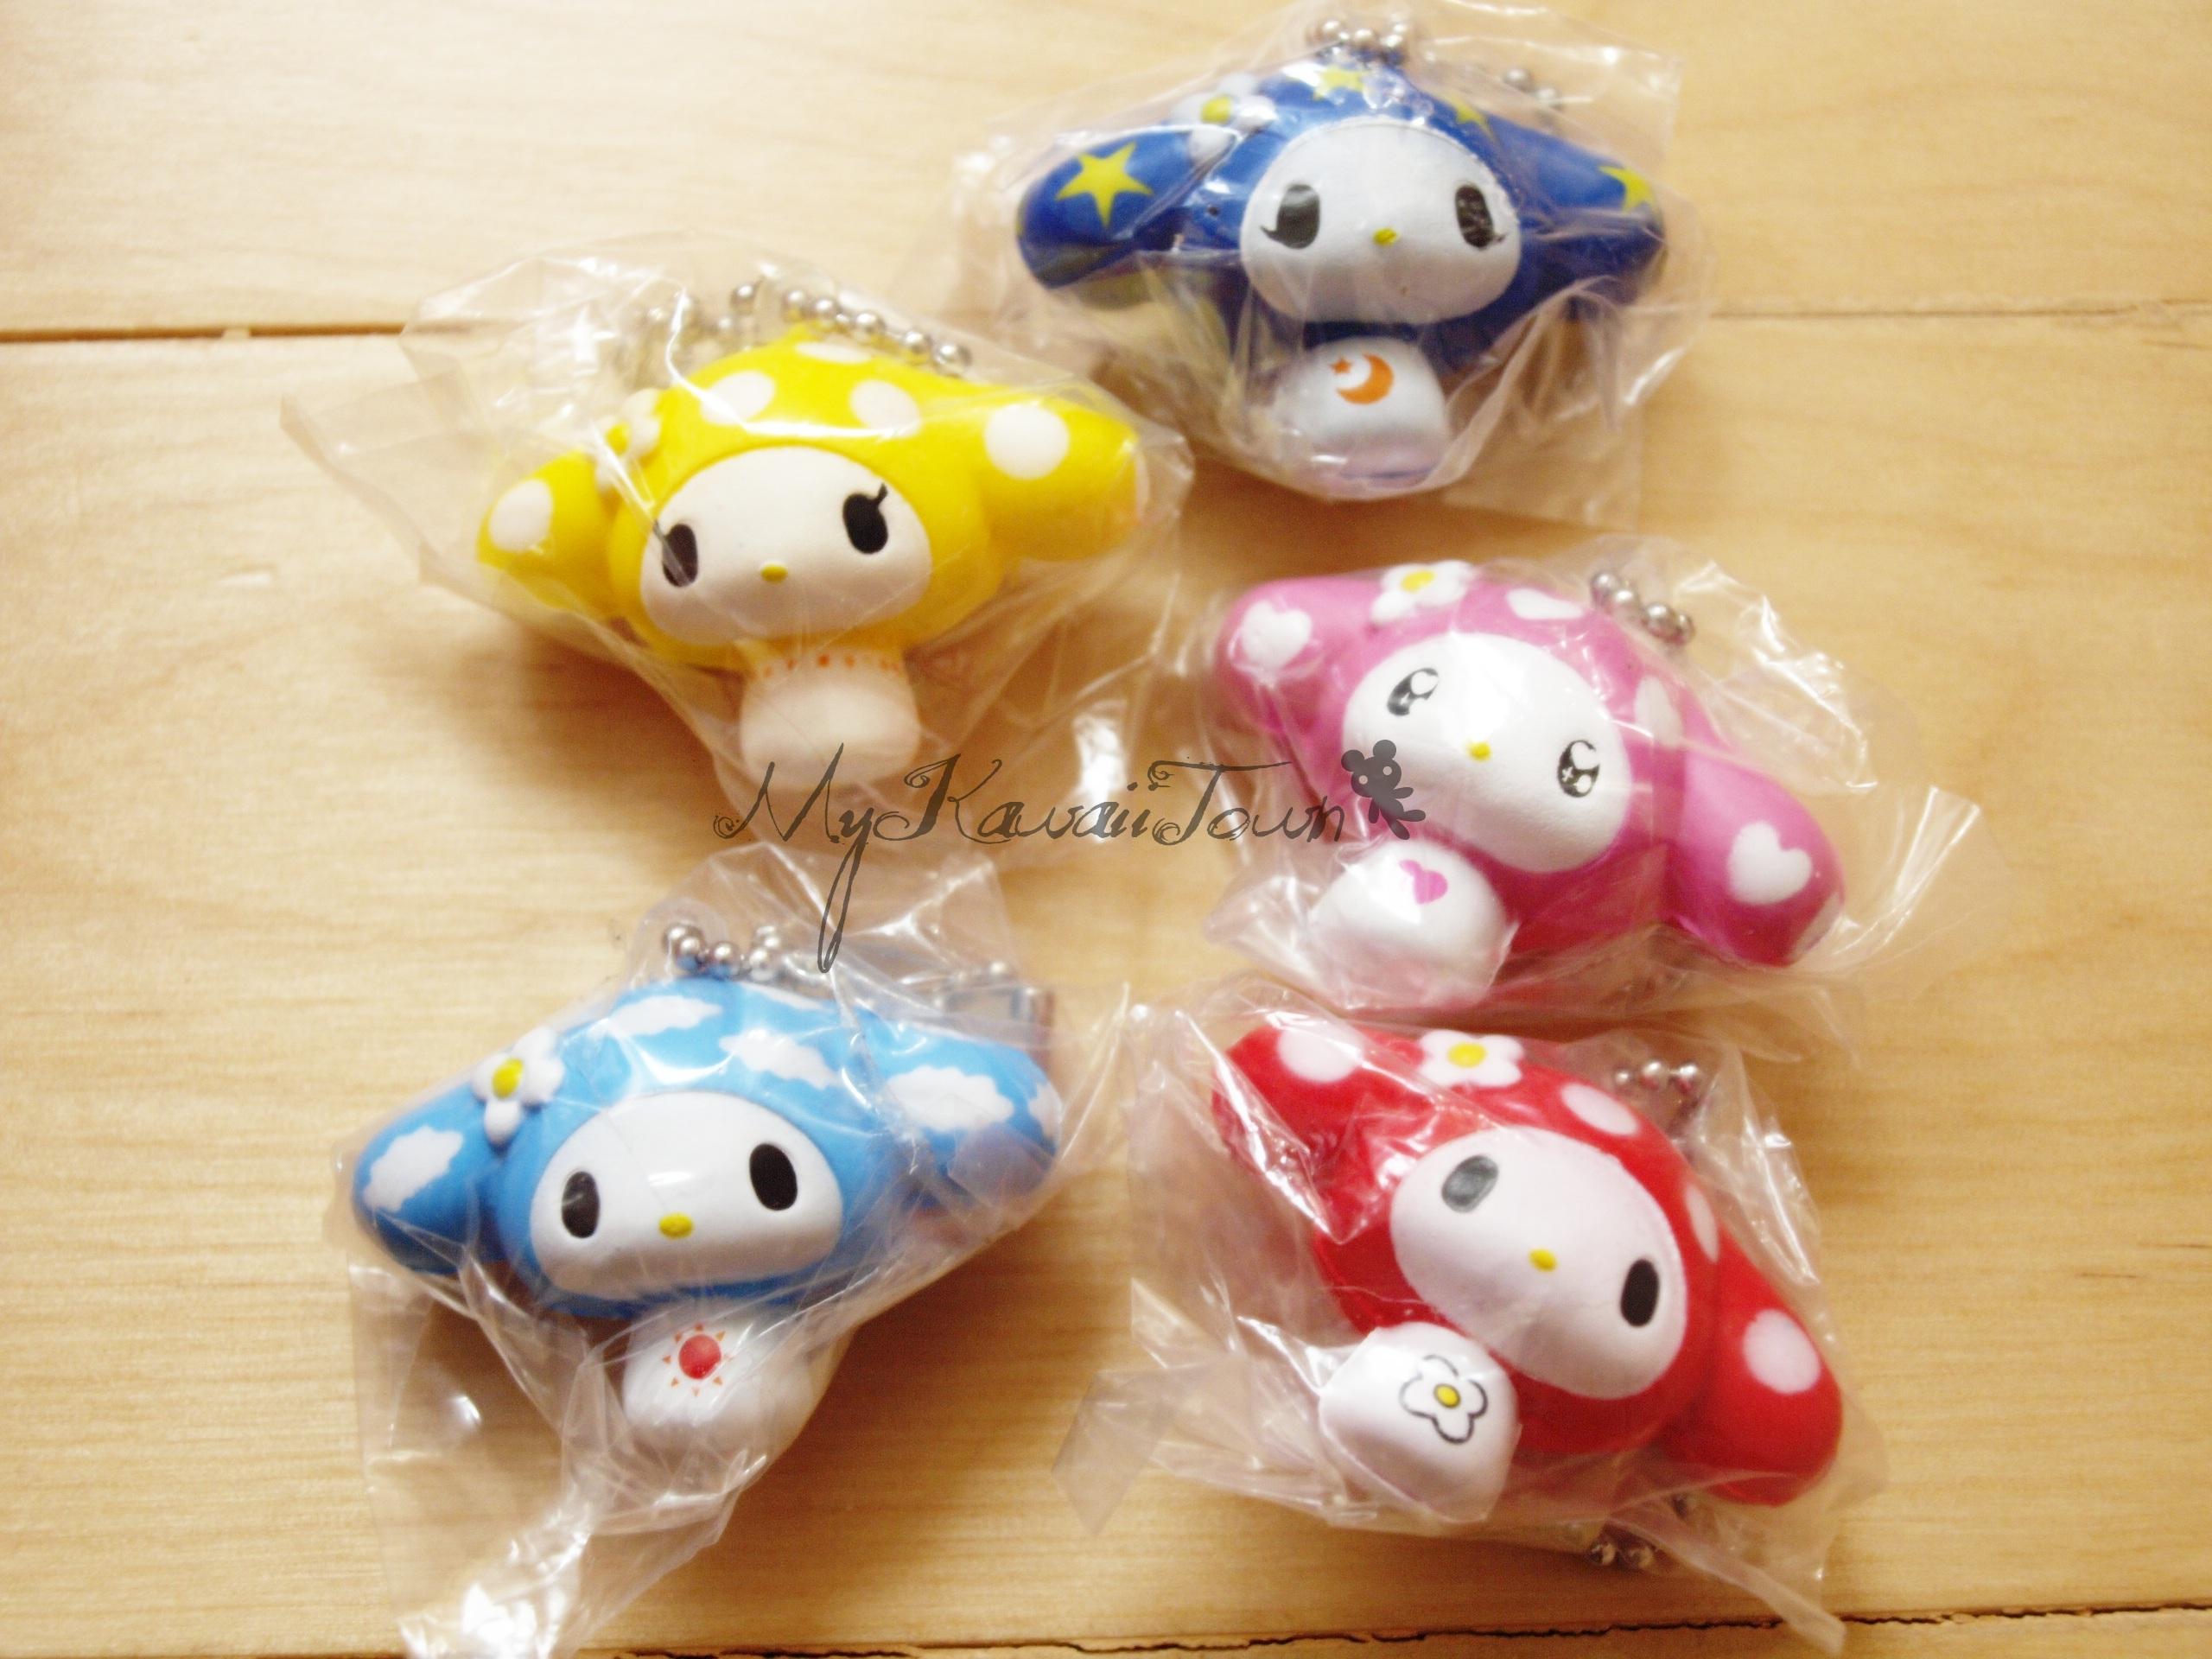 Squishies for sale - _5133387_original